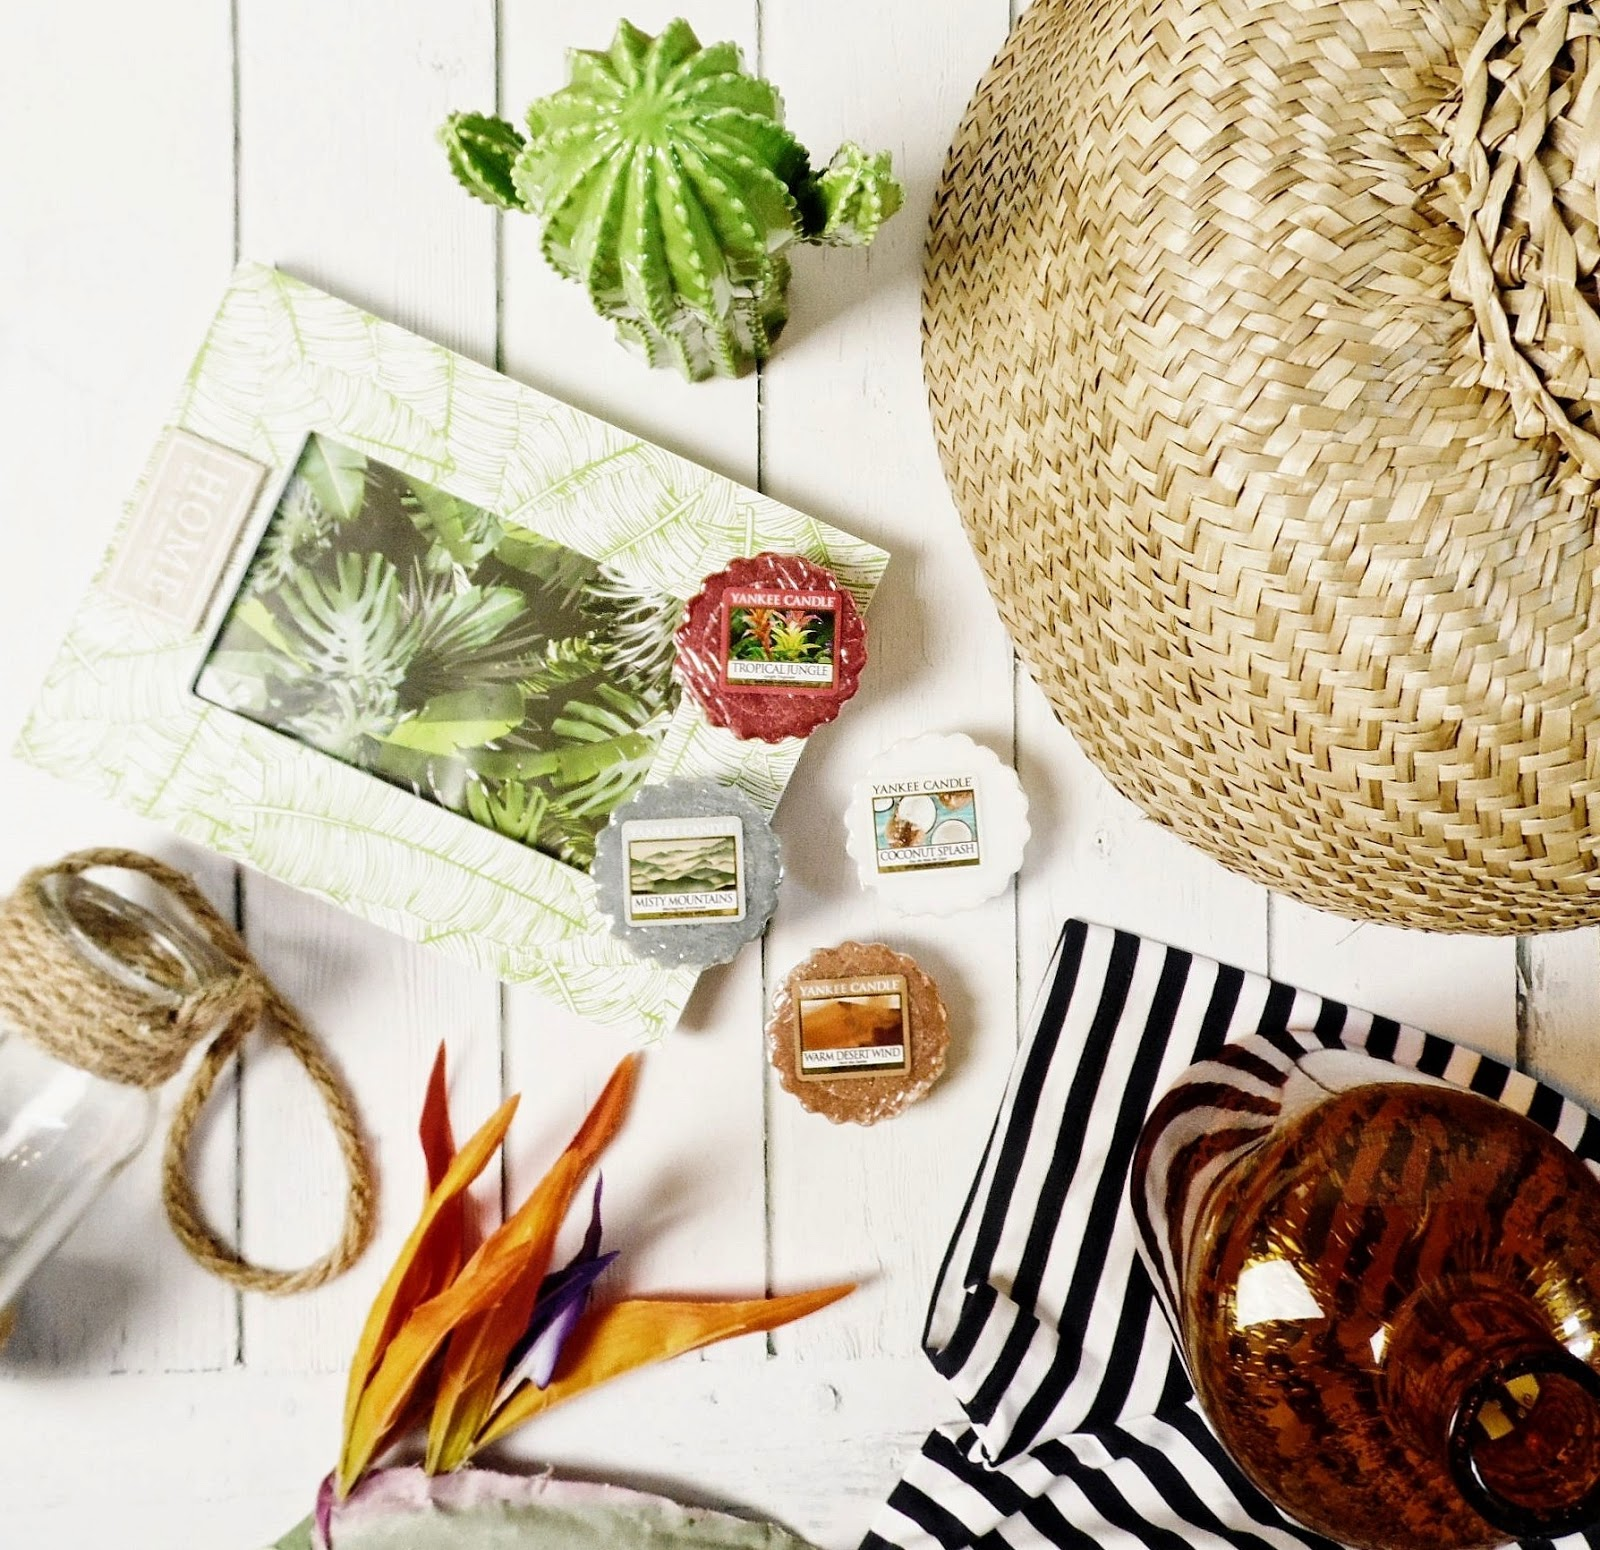 yankee candle just go q2 warm desert wind coconut splash tropical jungle misty mountains recenzja opinia blog